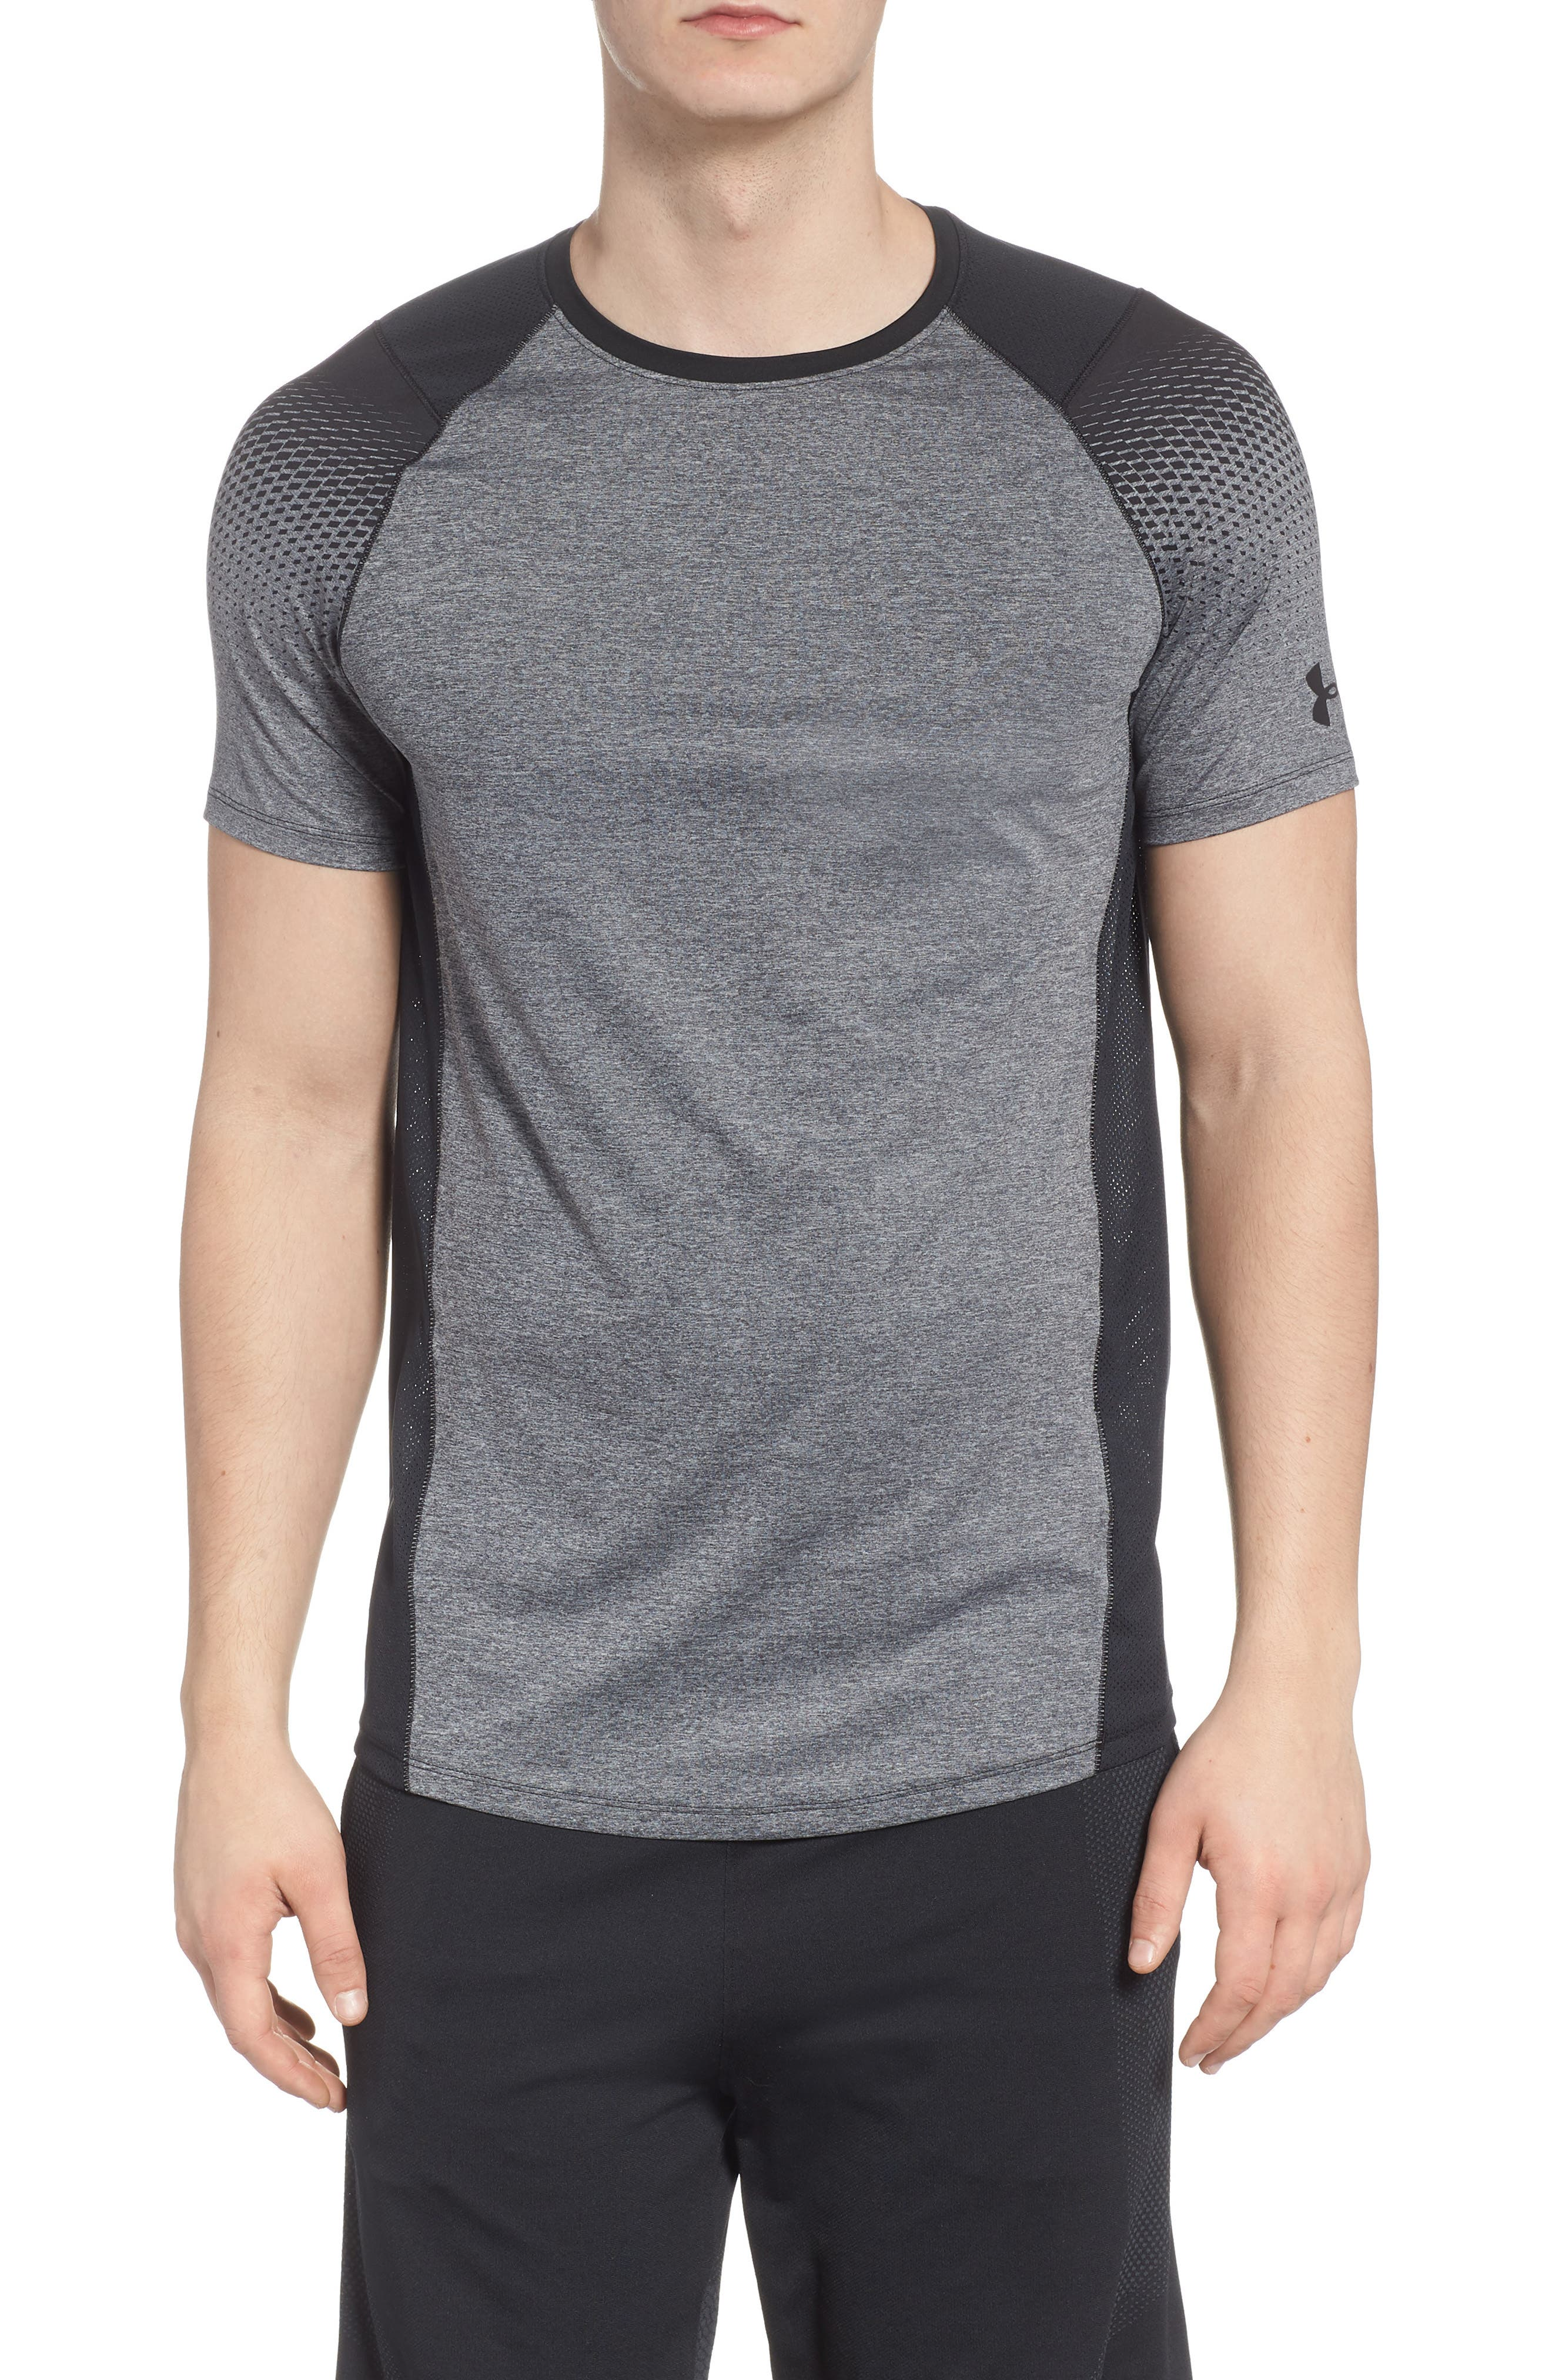 MK1 Dash Print Crewneck T-Shirt,                             Main thumbnail 1, color,                             001